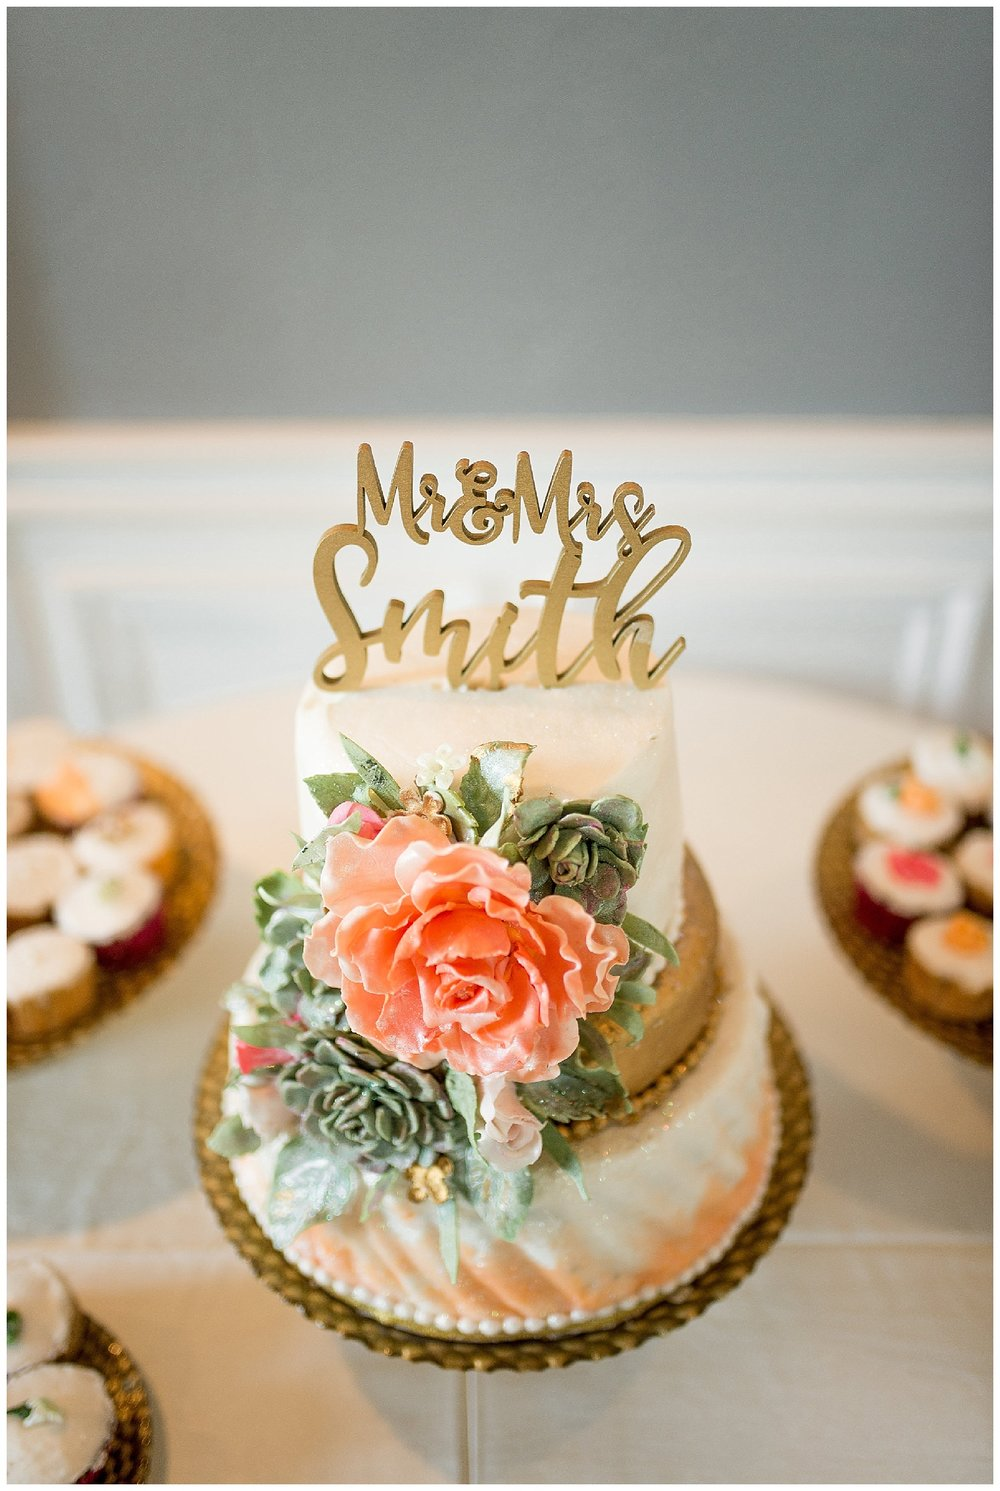 everleigh-photography-cincinnati-wedding-photographer-best-moments-of-2016-cincinnati-wedding-cincinnati-weddings-77